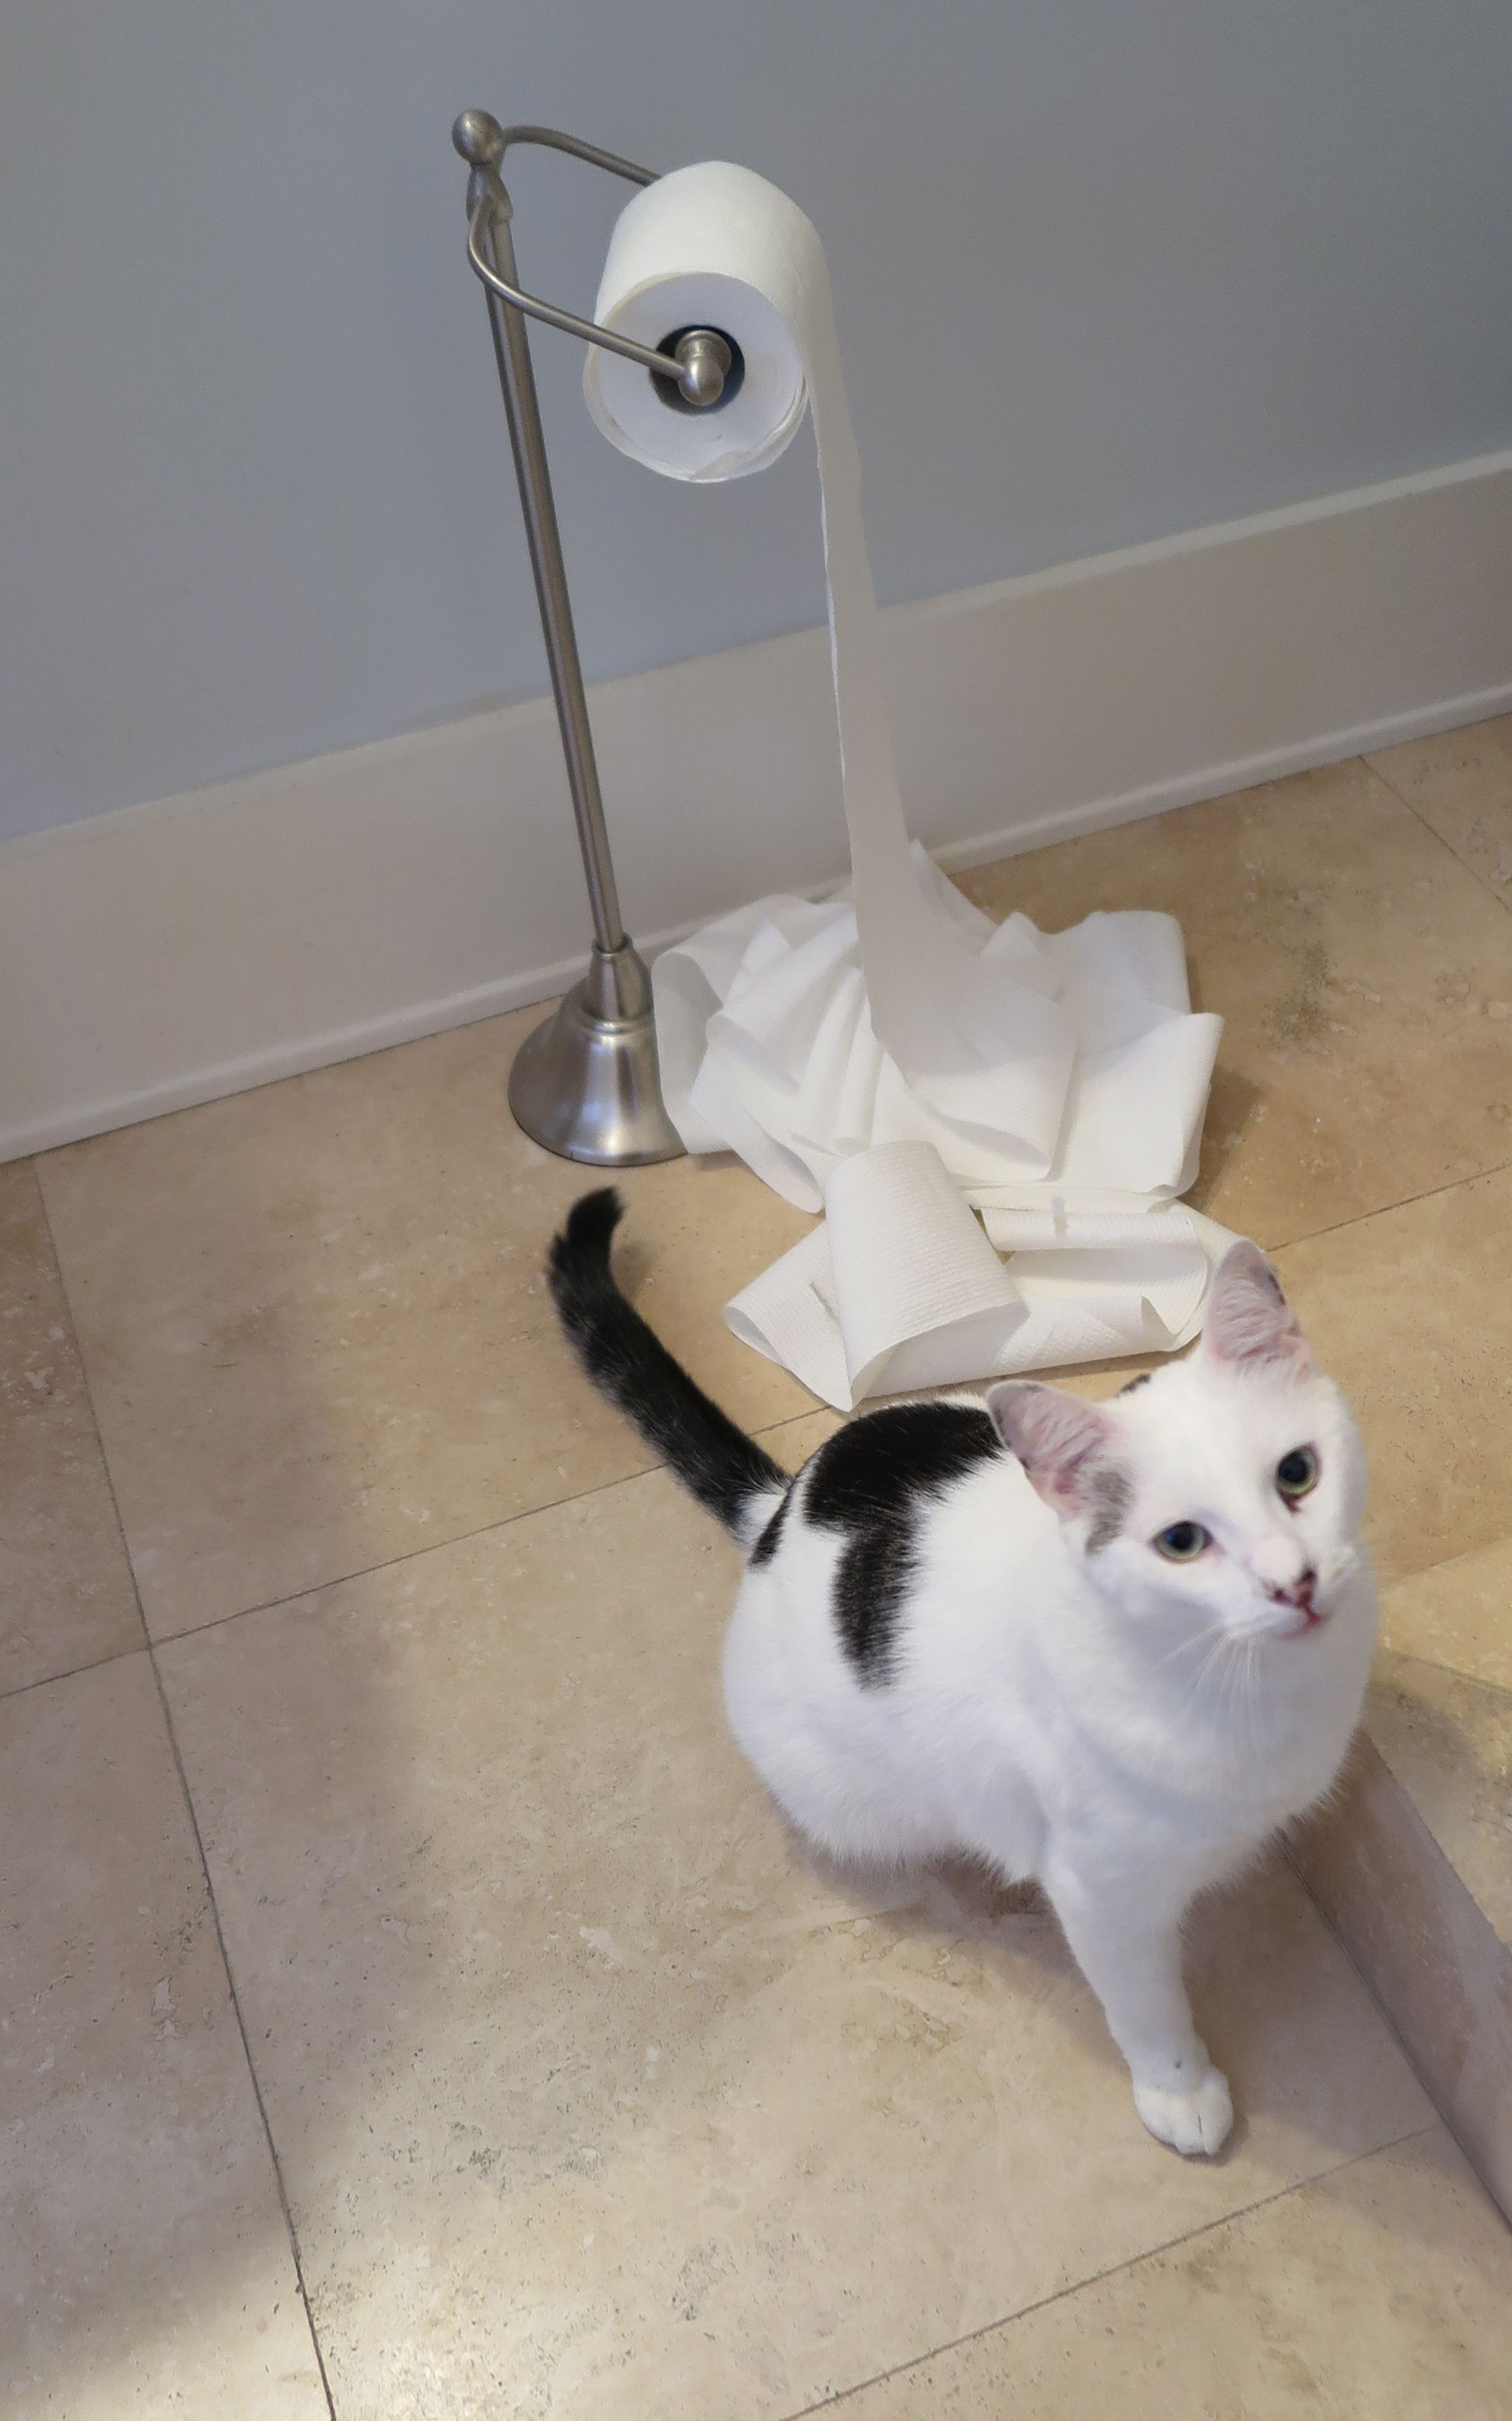 It wasn't me. Photo by Retagene Toilet paper holder